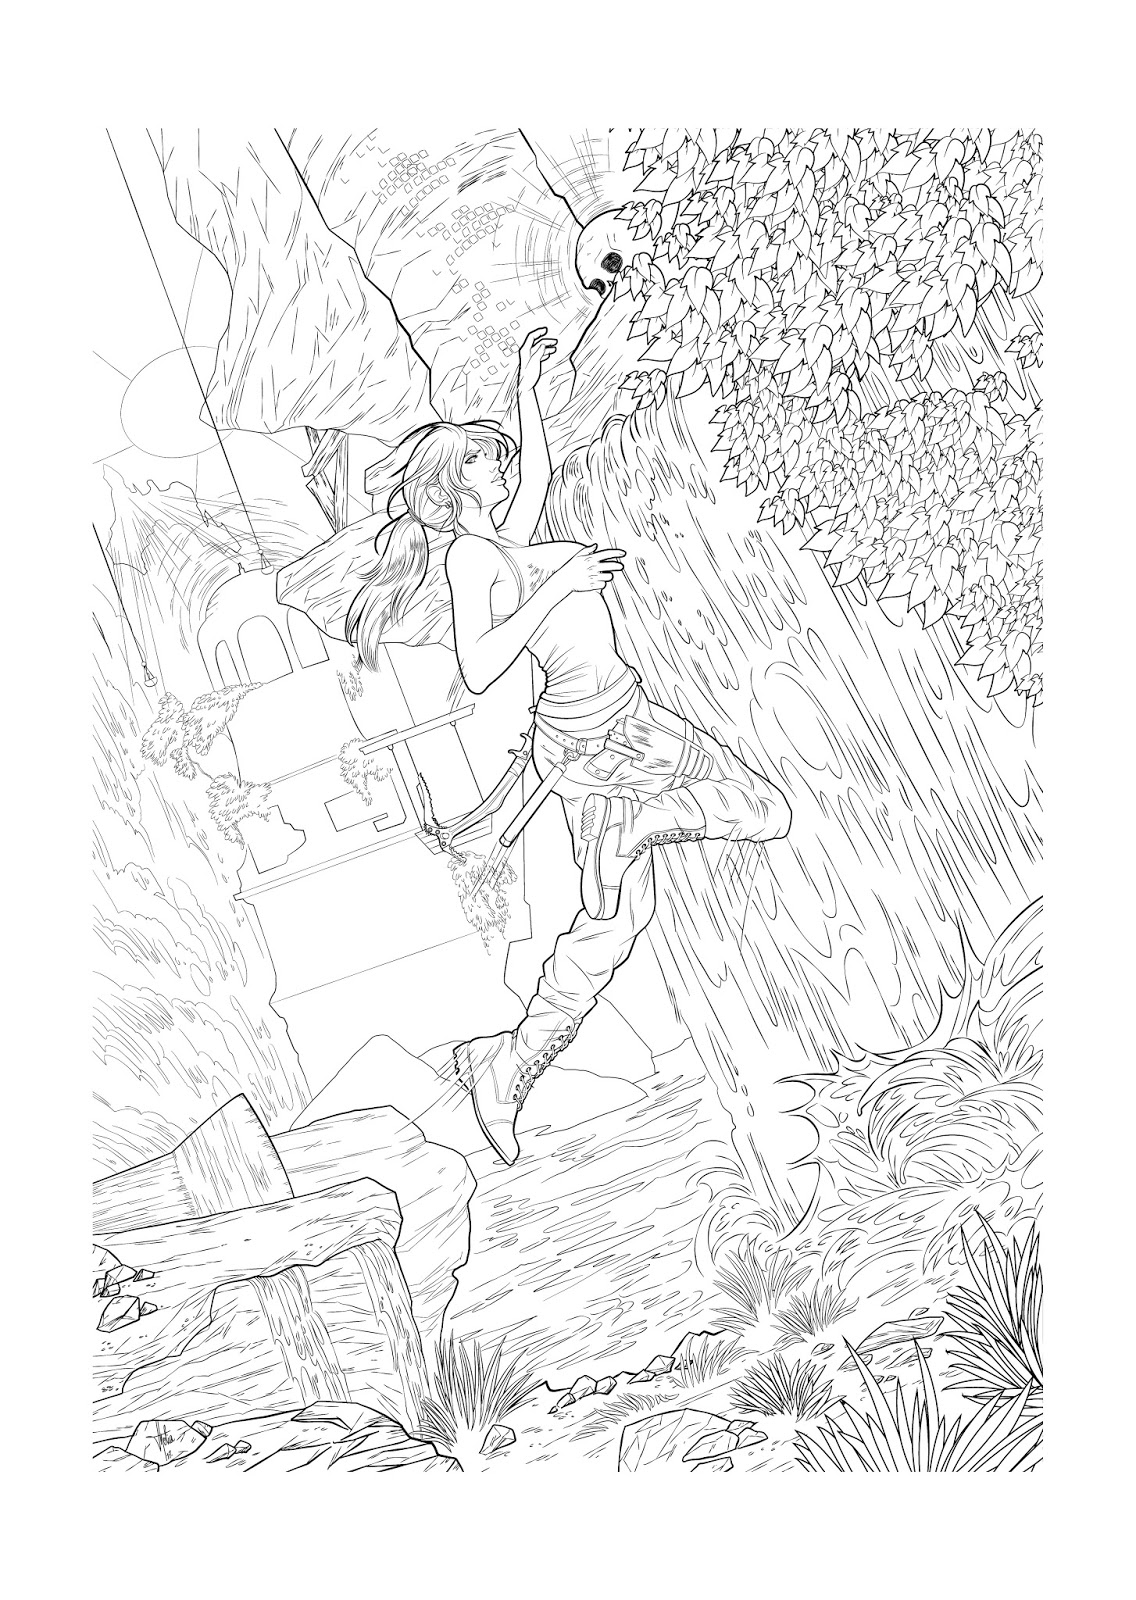 get the full resolution images via flikr - Lara Croft Coloring Pages